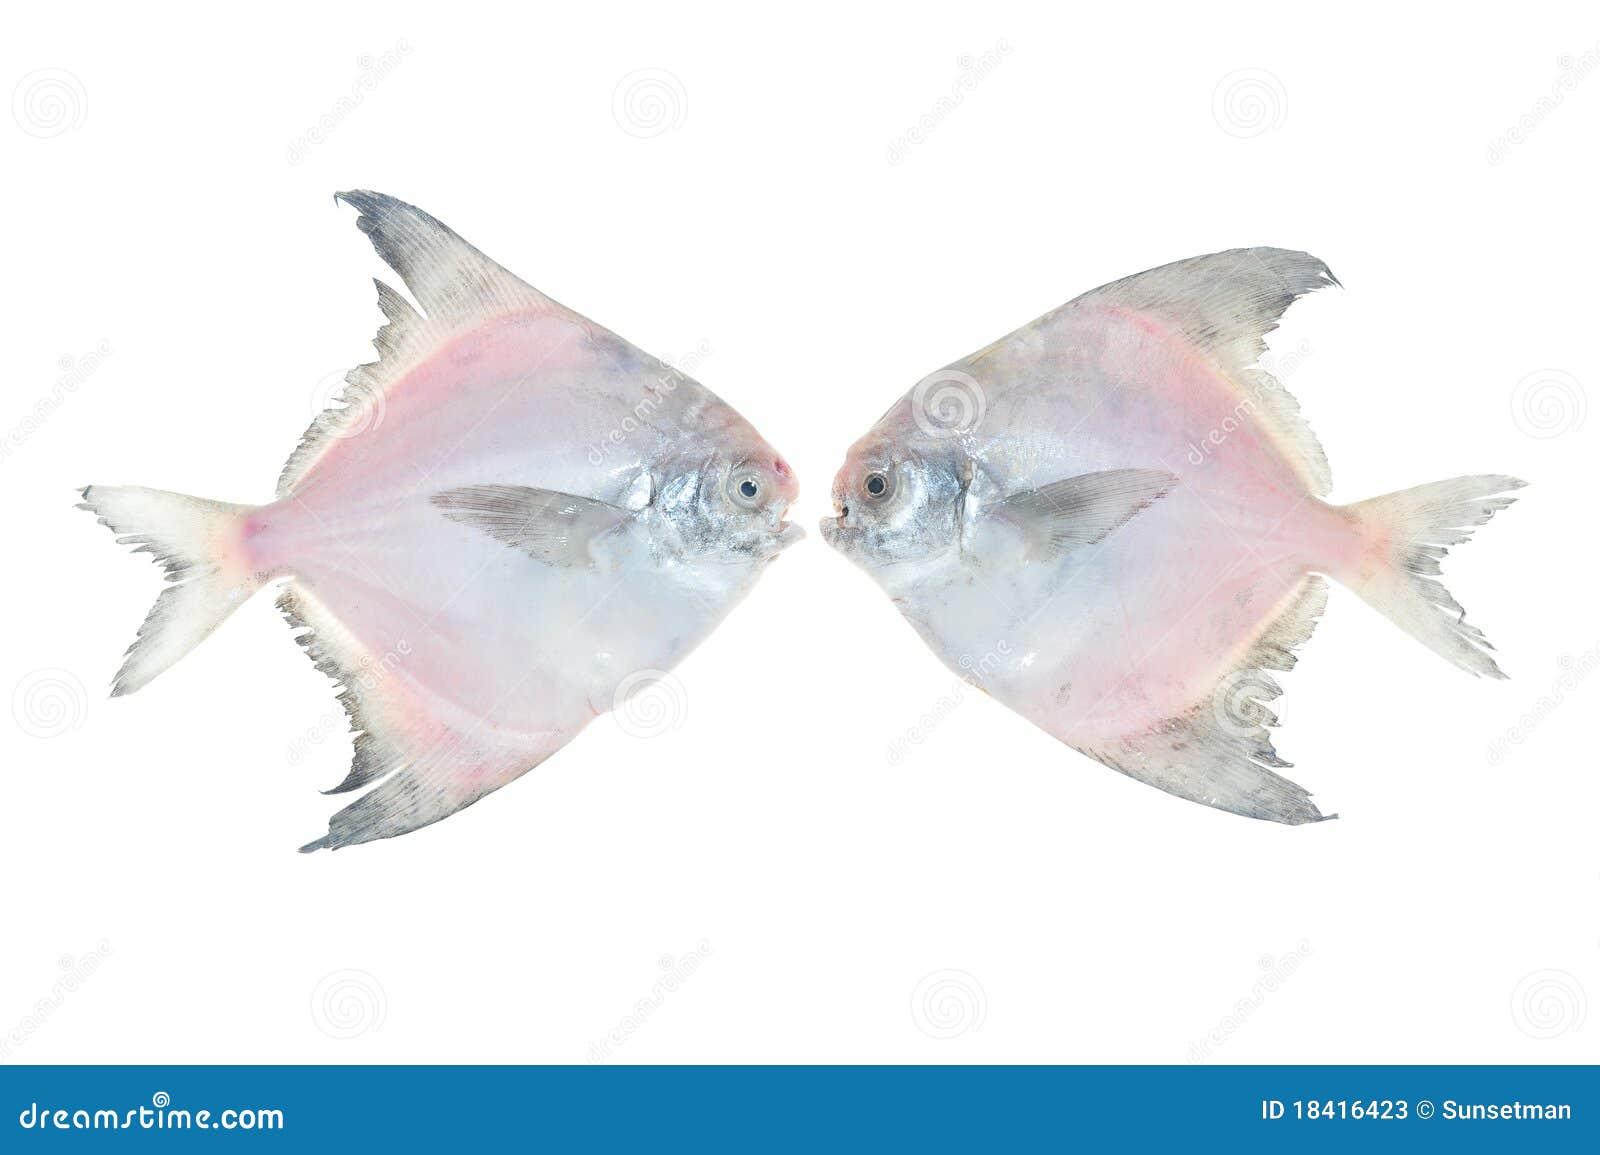 White Pomfret Fishes Stock Photos - Image: 18416423